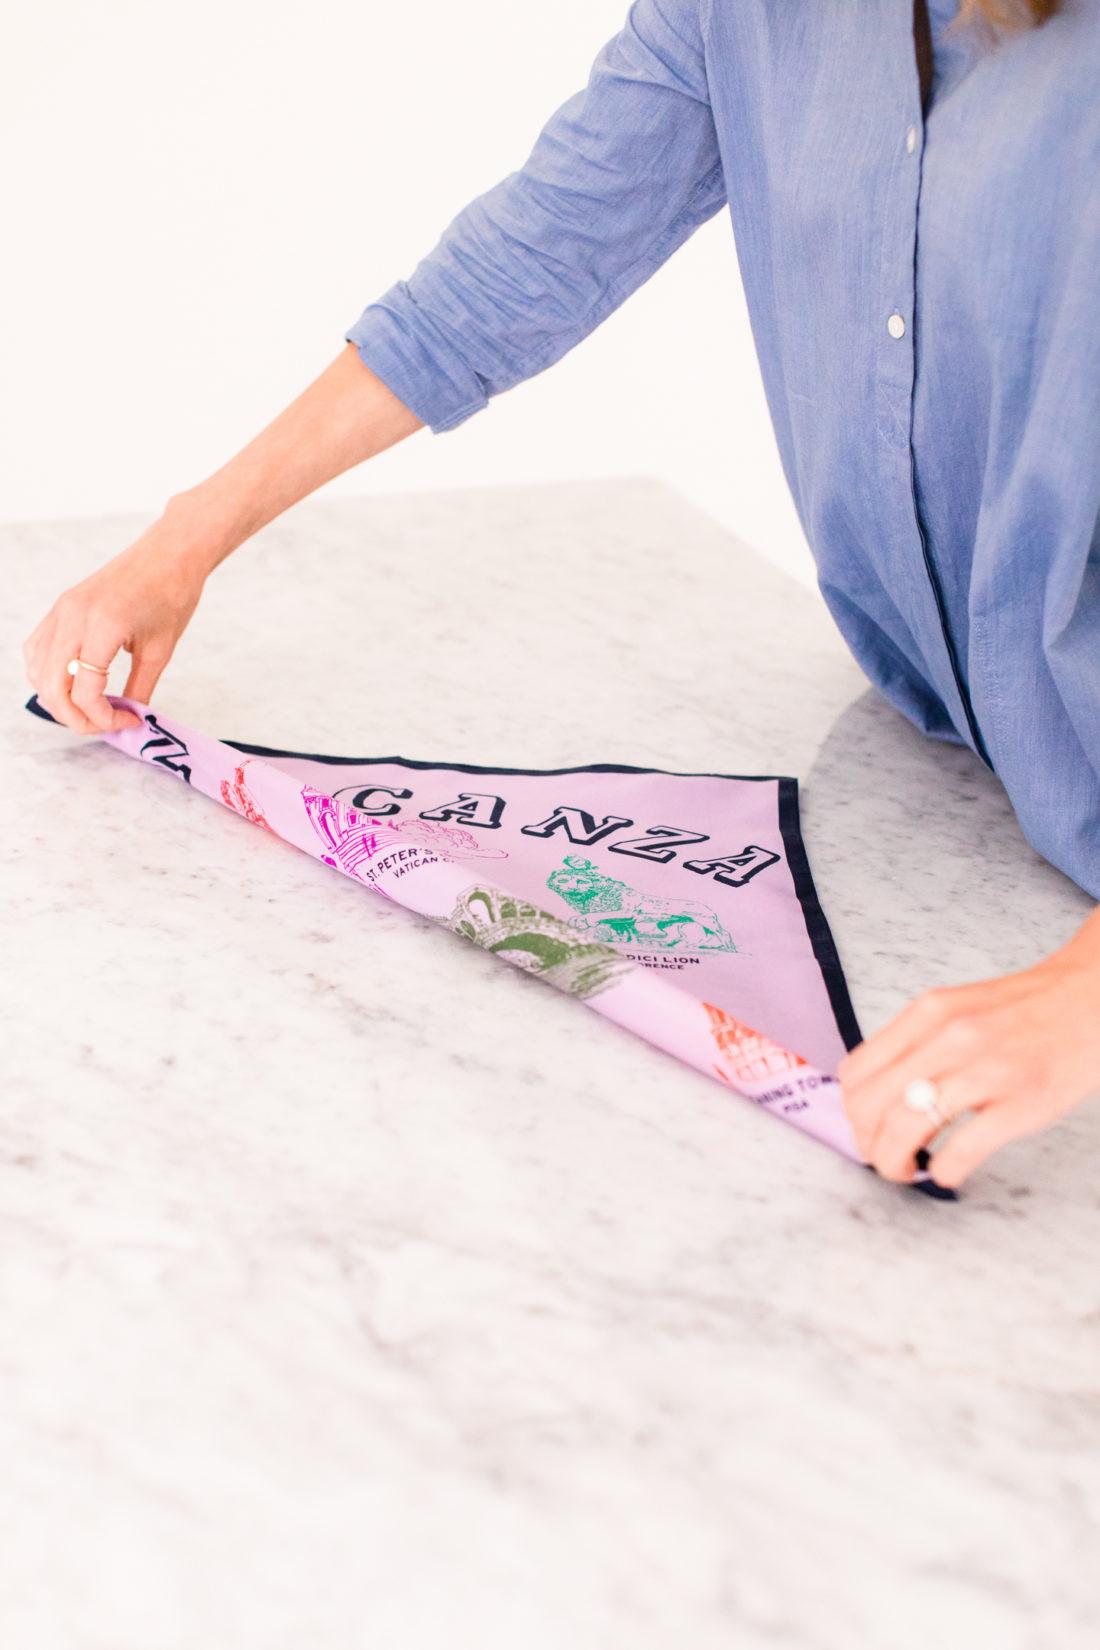 Eva Amurri Martino folds a square silk scarf to tie in to a kerchief choker